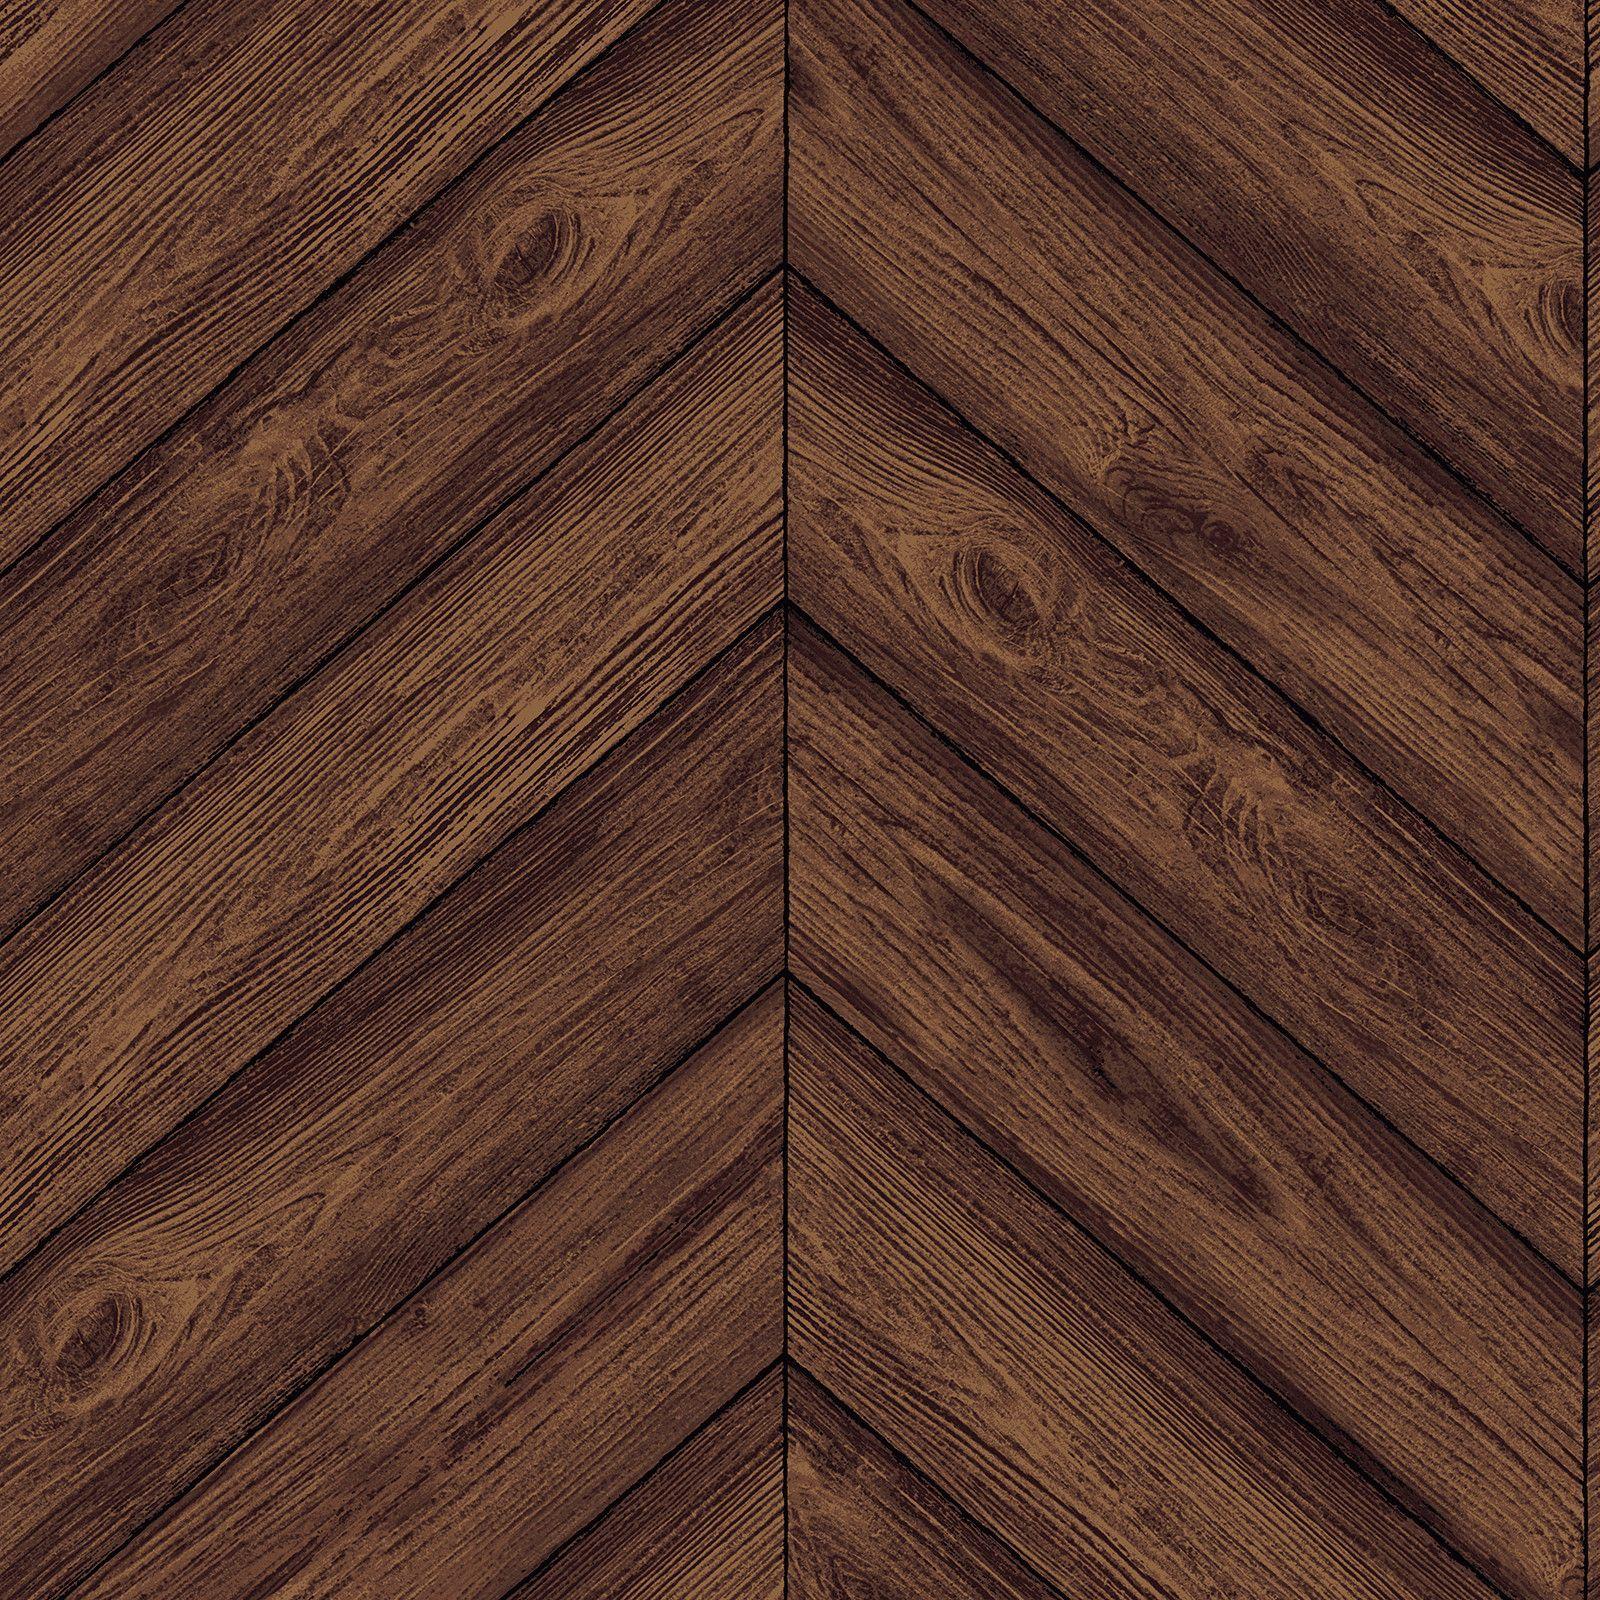 Sample Herringbone Walnut Textured Self Adhesive Wallpaper By Tempaper Removable Wallpaper Herringbone Wallpaper Temporary Wallpaper